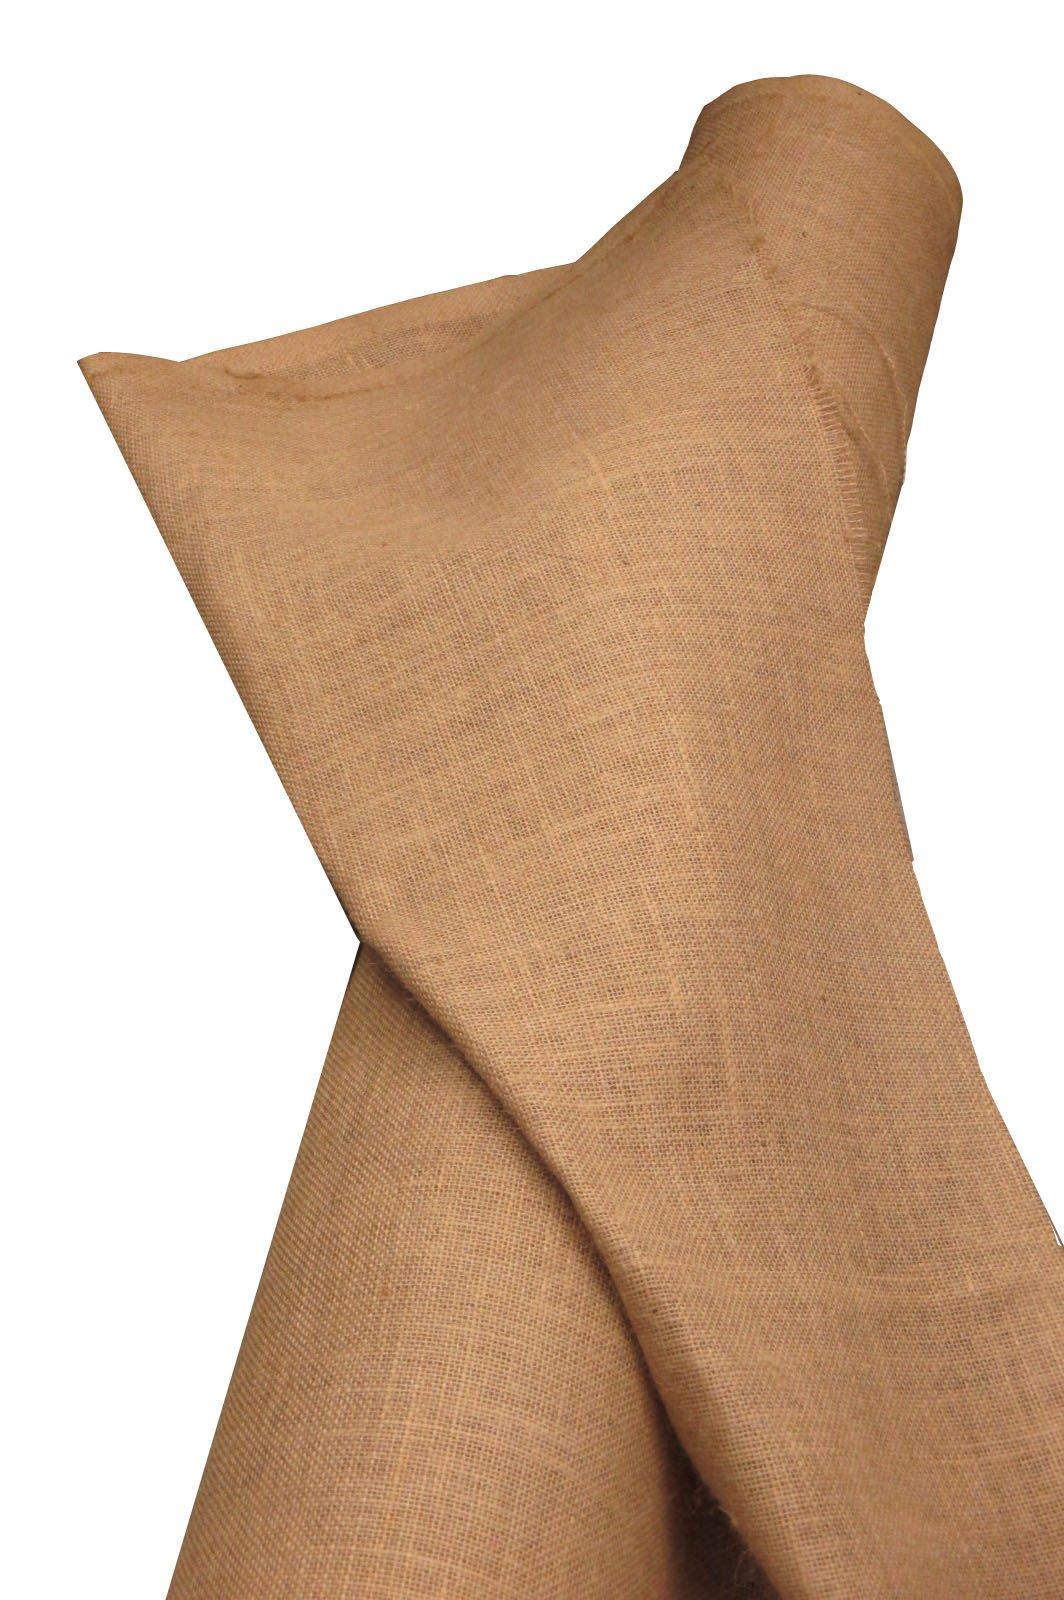 LA Linen 60-Inch Wide  Natural Burlap , 60 Yard Roll by LA Linen (Image #1)